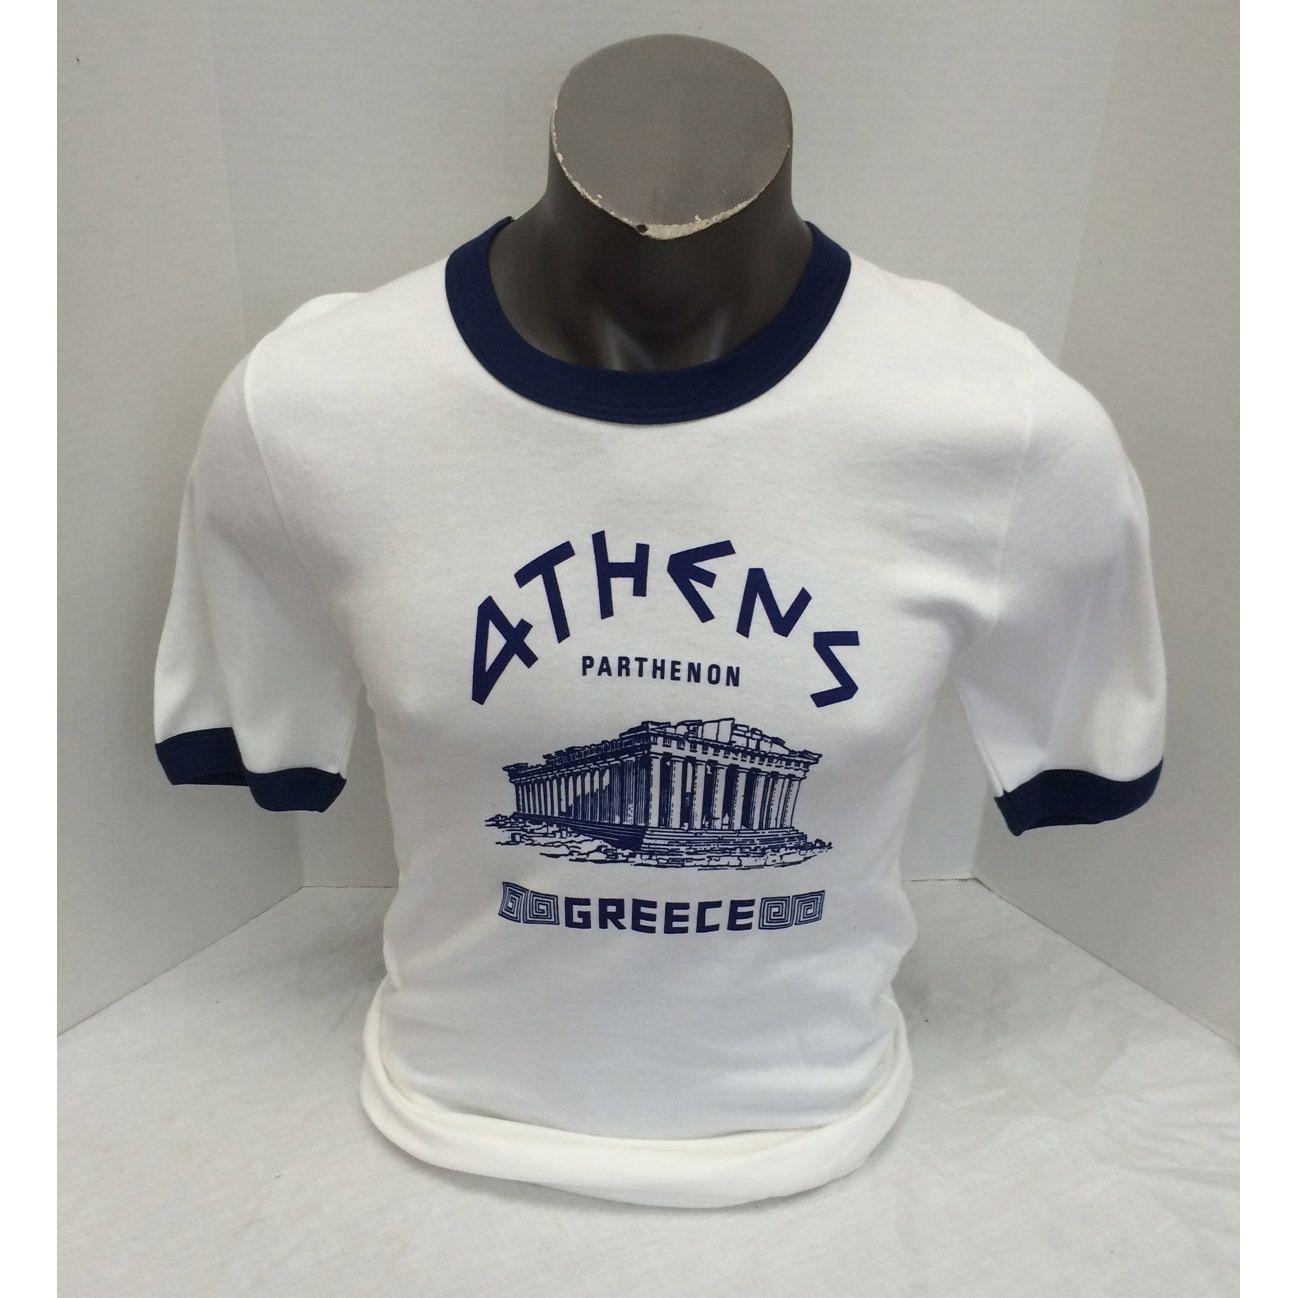 White Navy Ringer Athens Parthenon Souvenir T-Shirt Vintage 1970s Tee Shirt  Cotton - pinned by pin4etsy.com c2656bb51f5